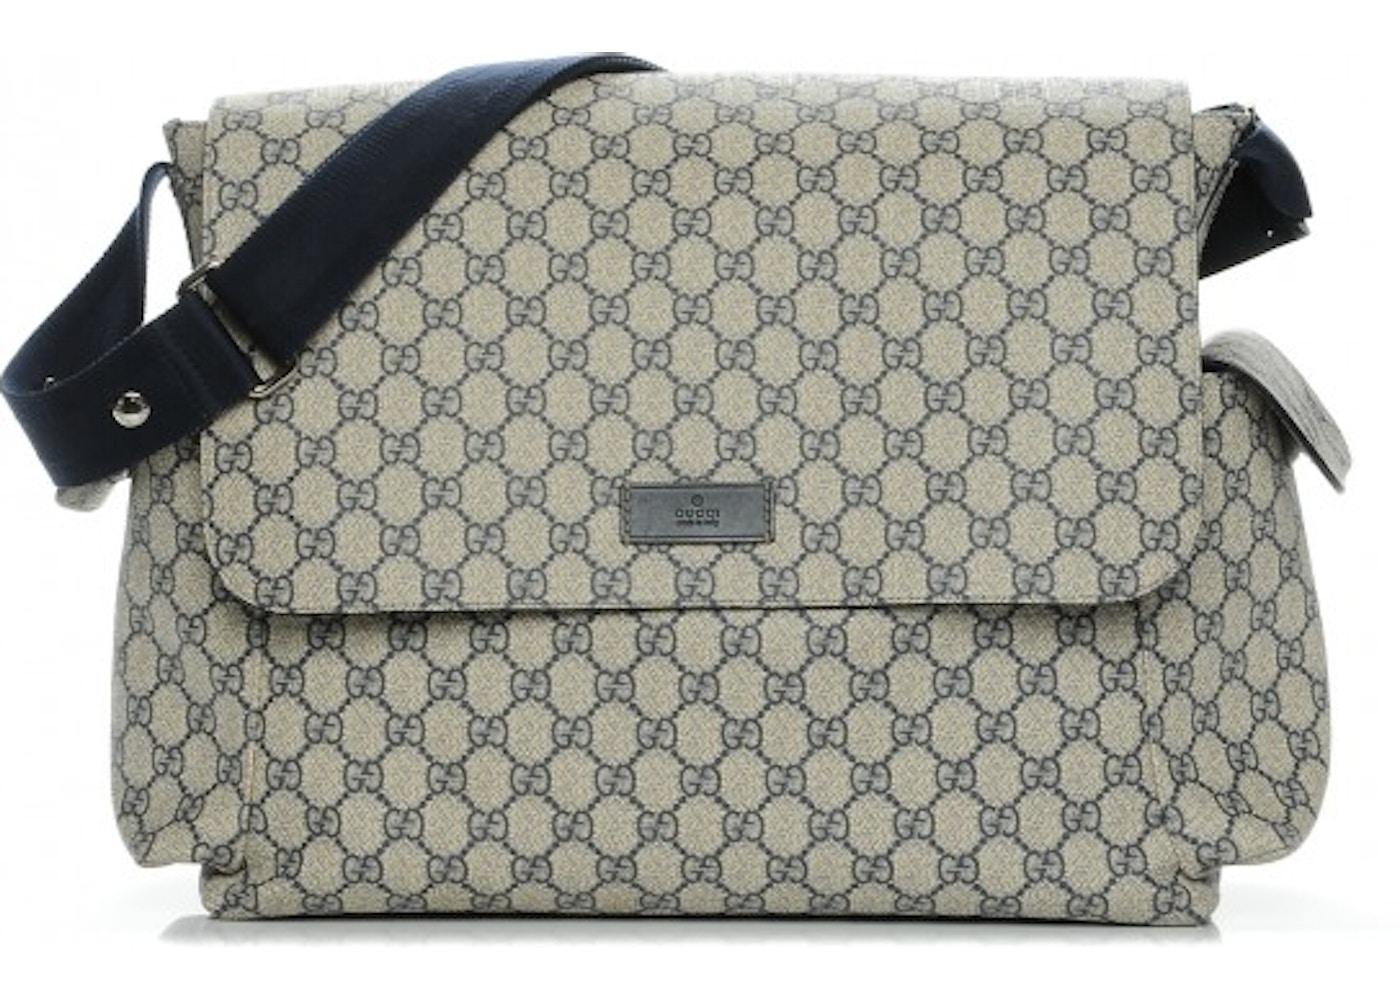 b09a73f47 Gucci Diaper Bag Messenger Monogram GG Plus Beige/Navy. Monogram GG Plus  Beige/Navy